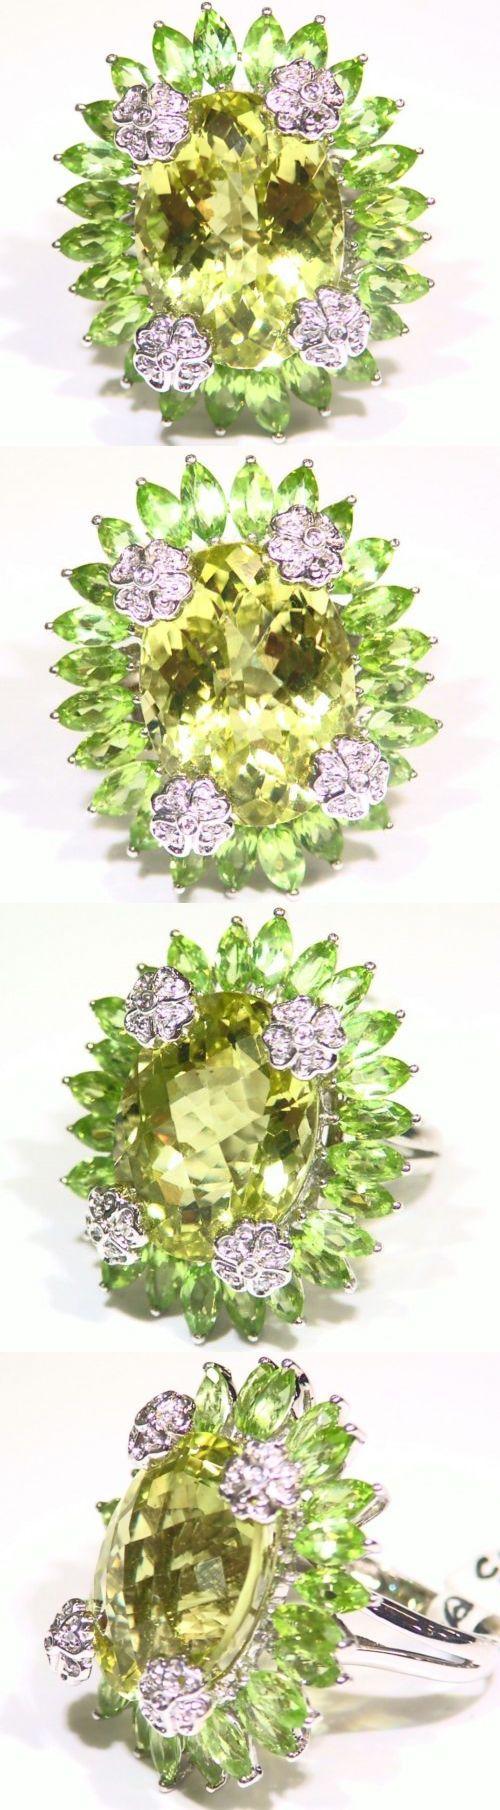 Rings 165044: Vintage 18K Gold Natural Peridot Diamond Quartz Flower Engagement Ring Art Deco -> BUY IT NOW ONLY: $1721 on eBay!